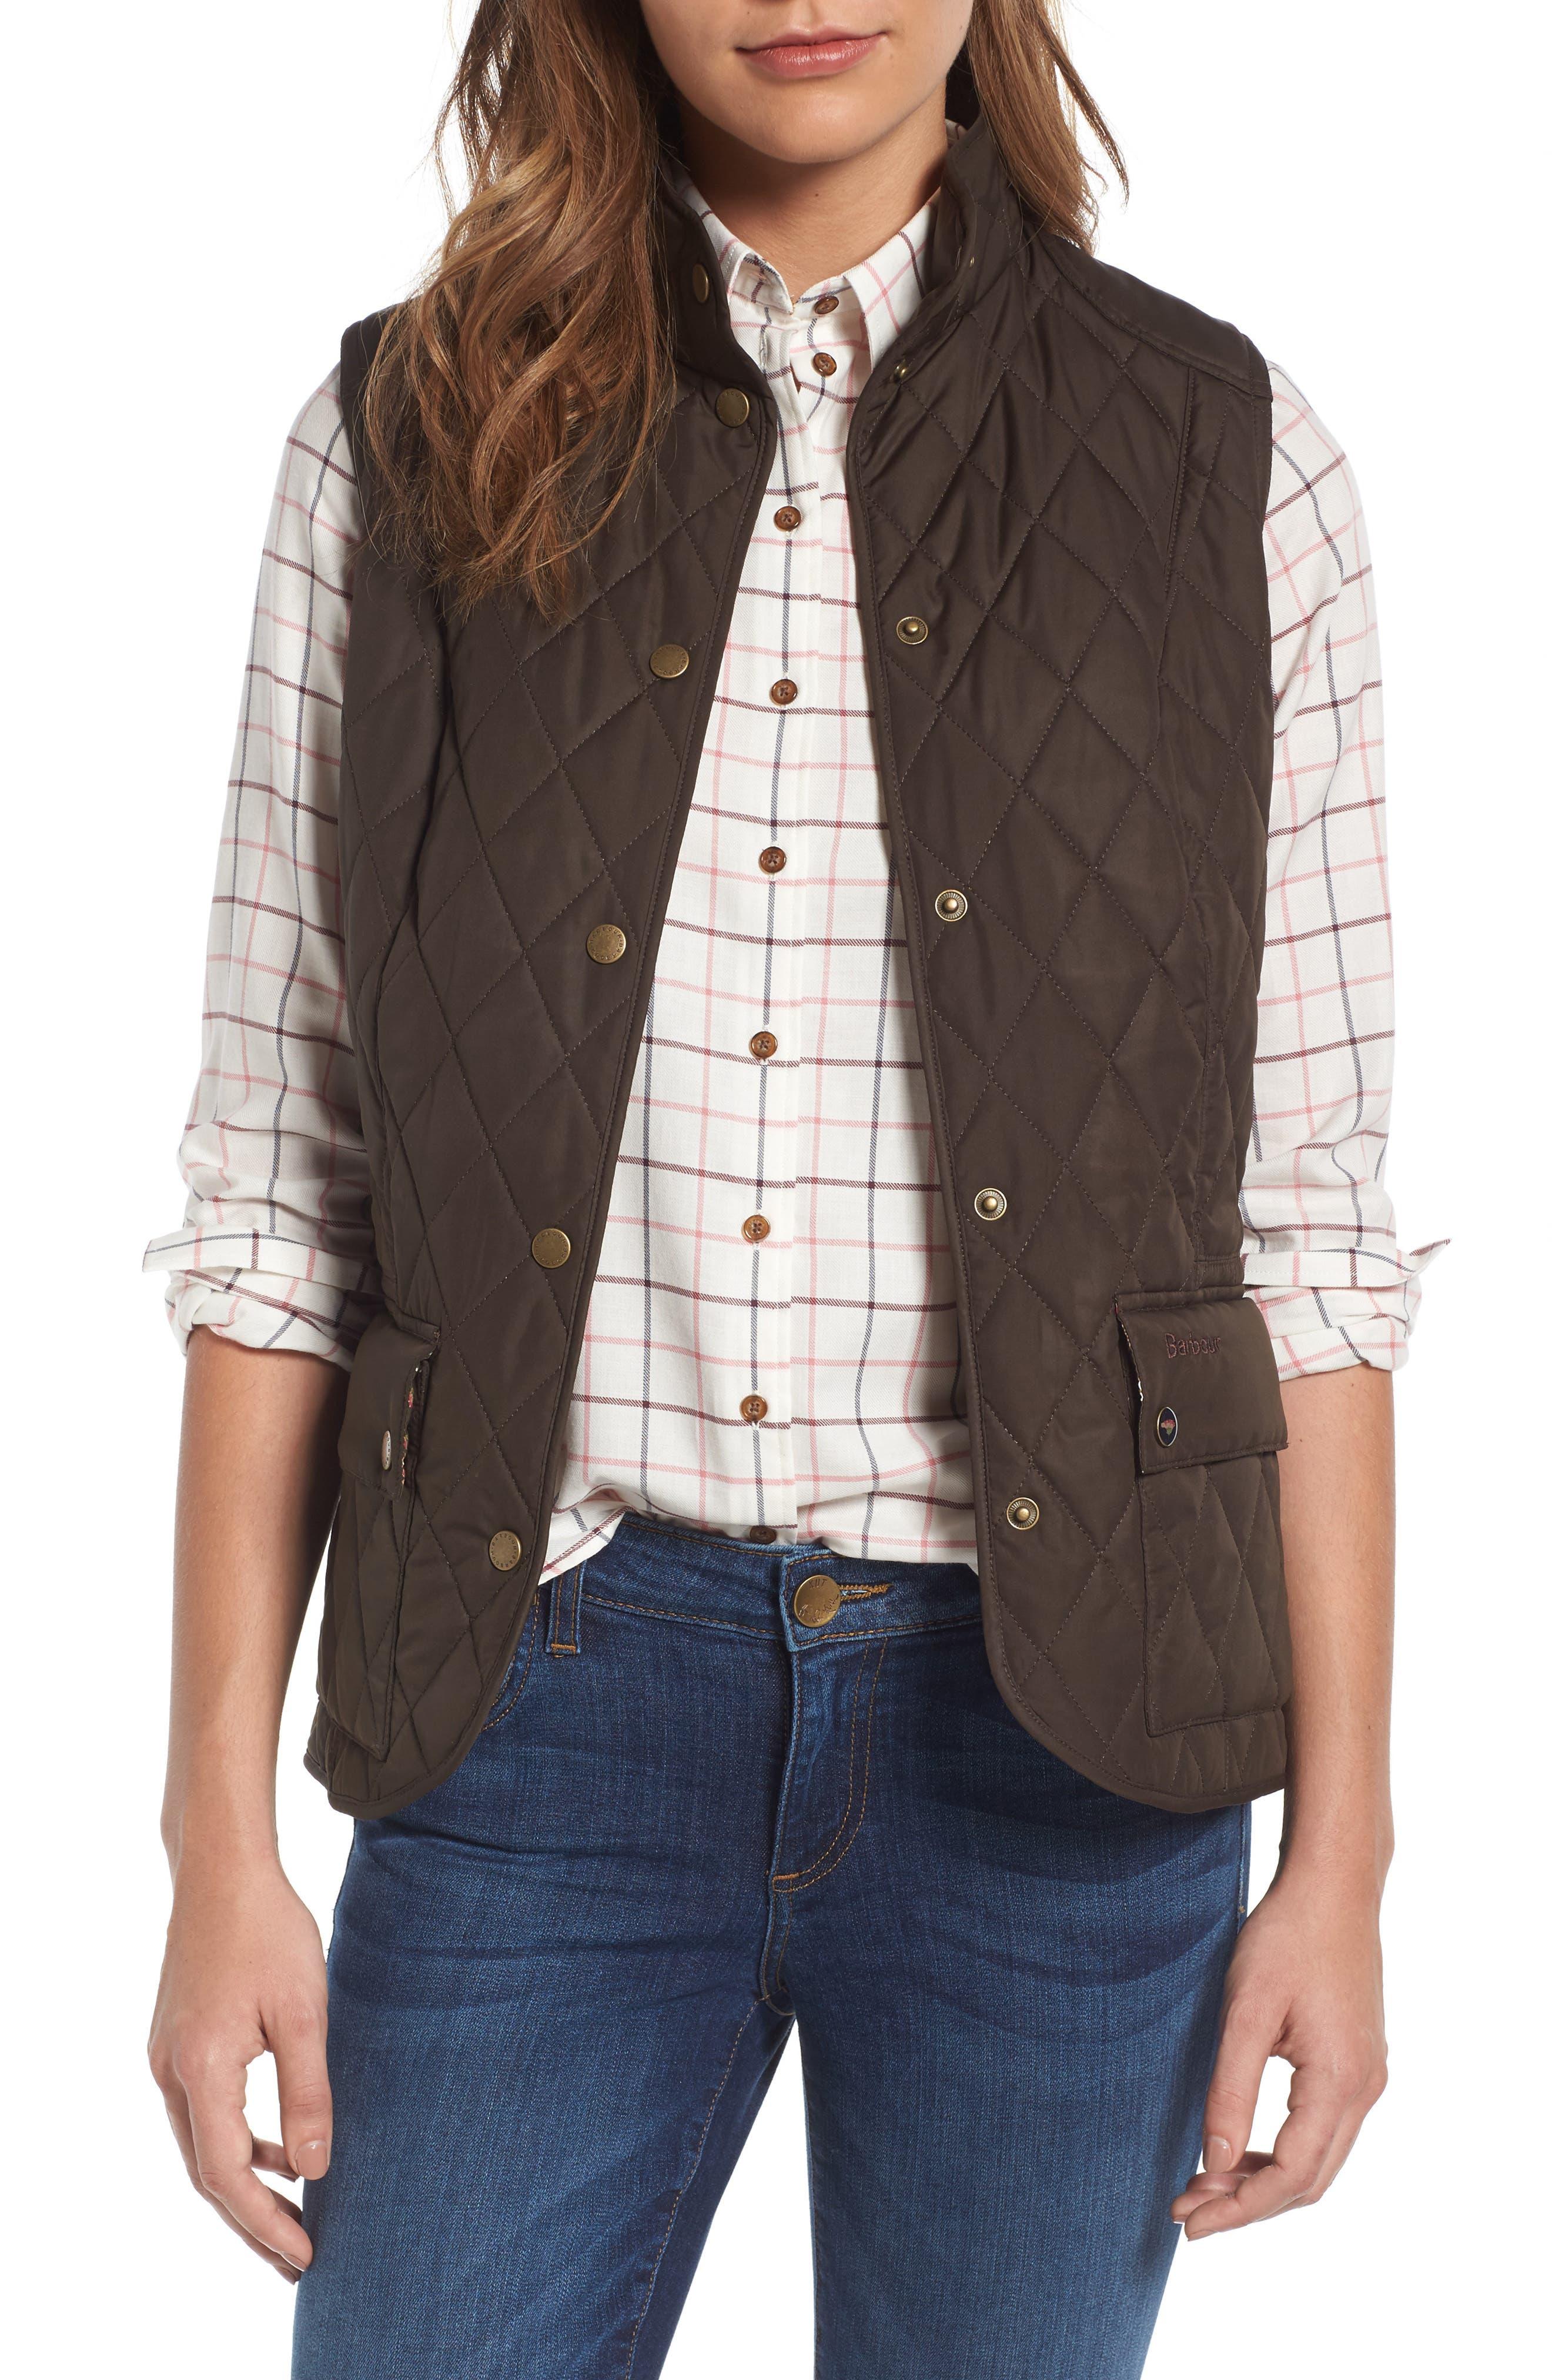 Saddleworth Quilted Vest,                             Main thumbnail 1, color,                             Olive